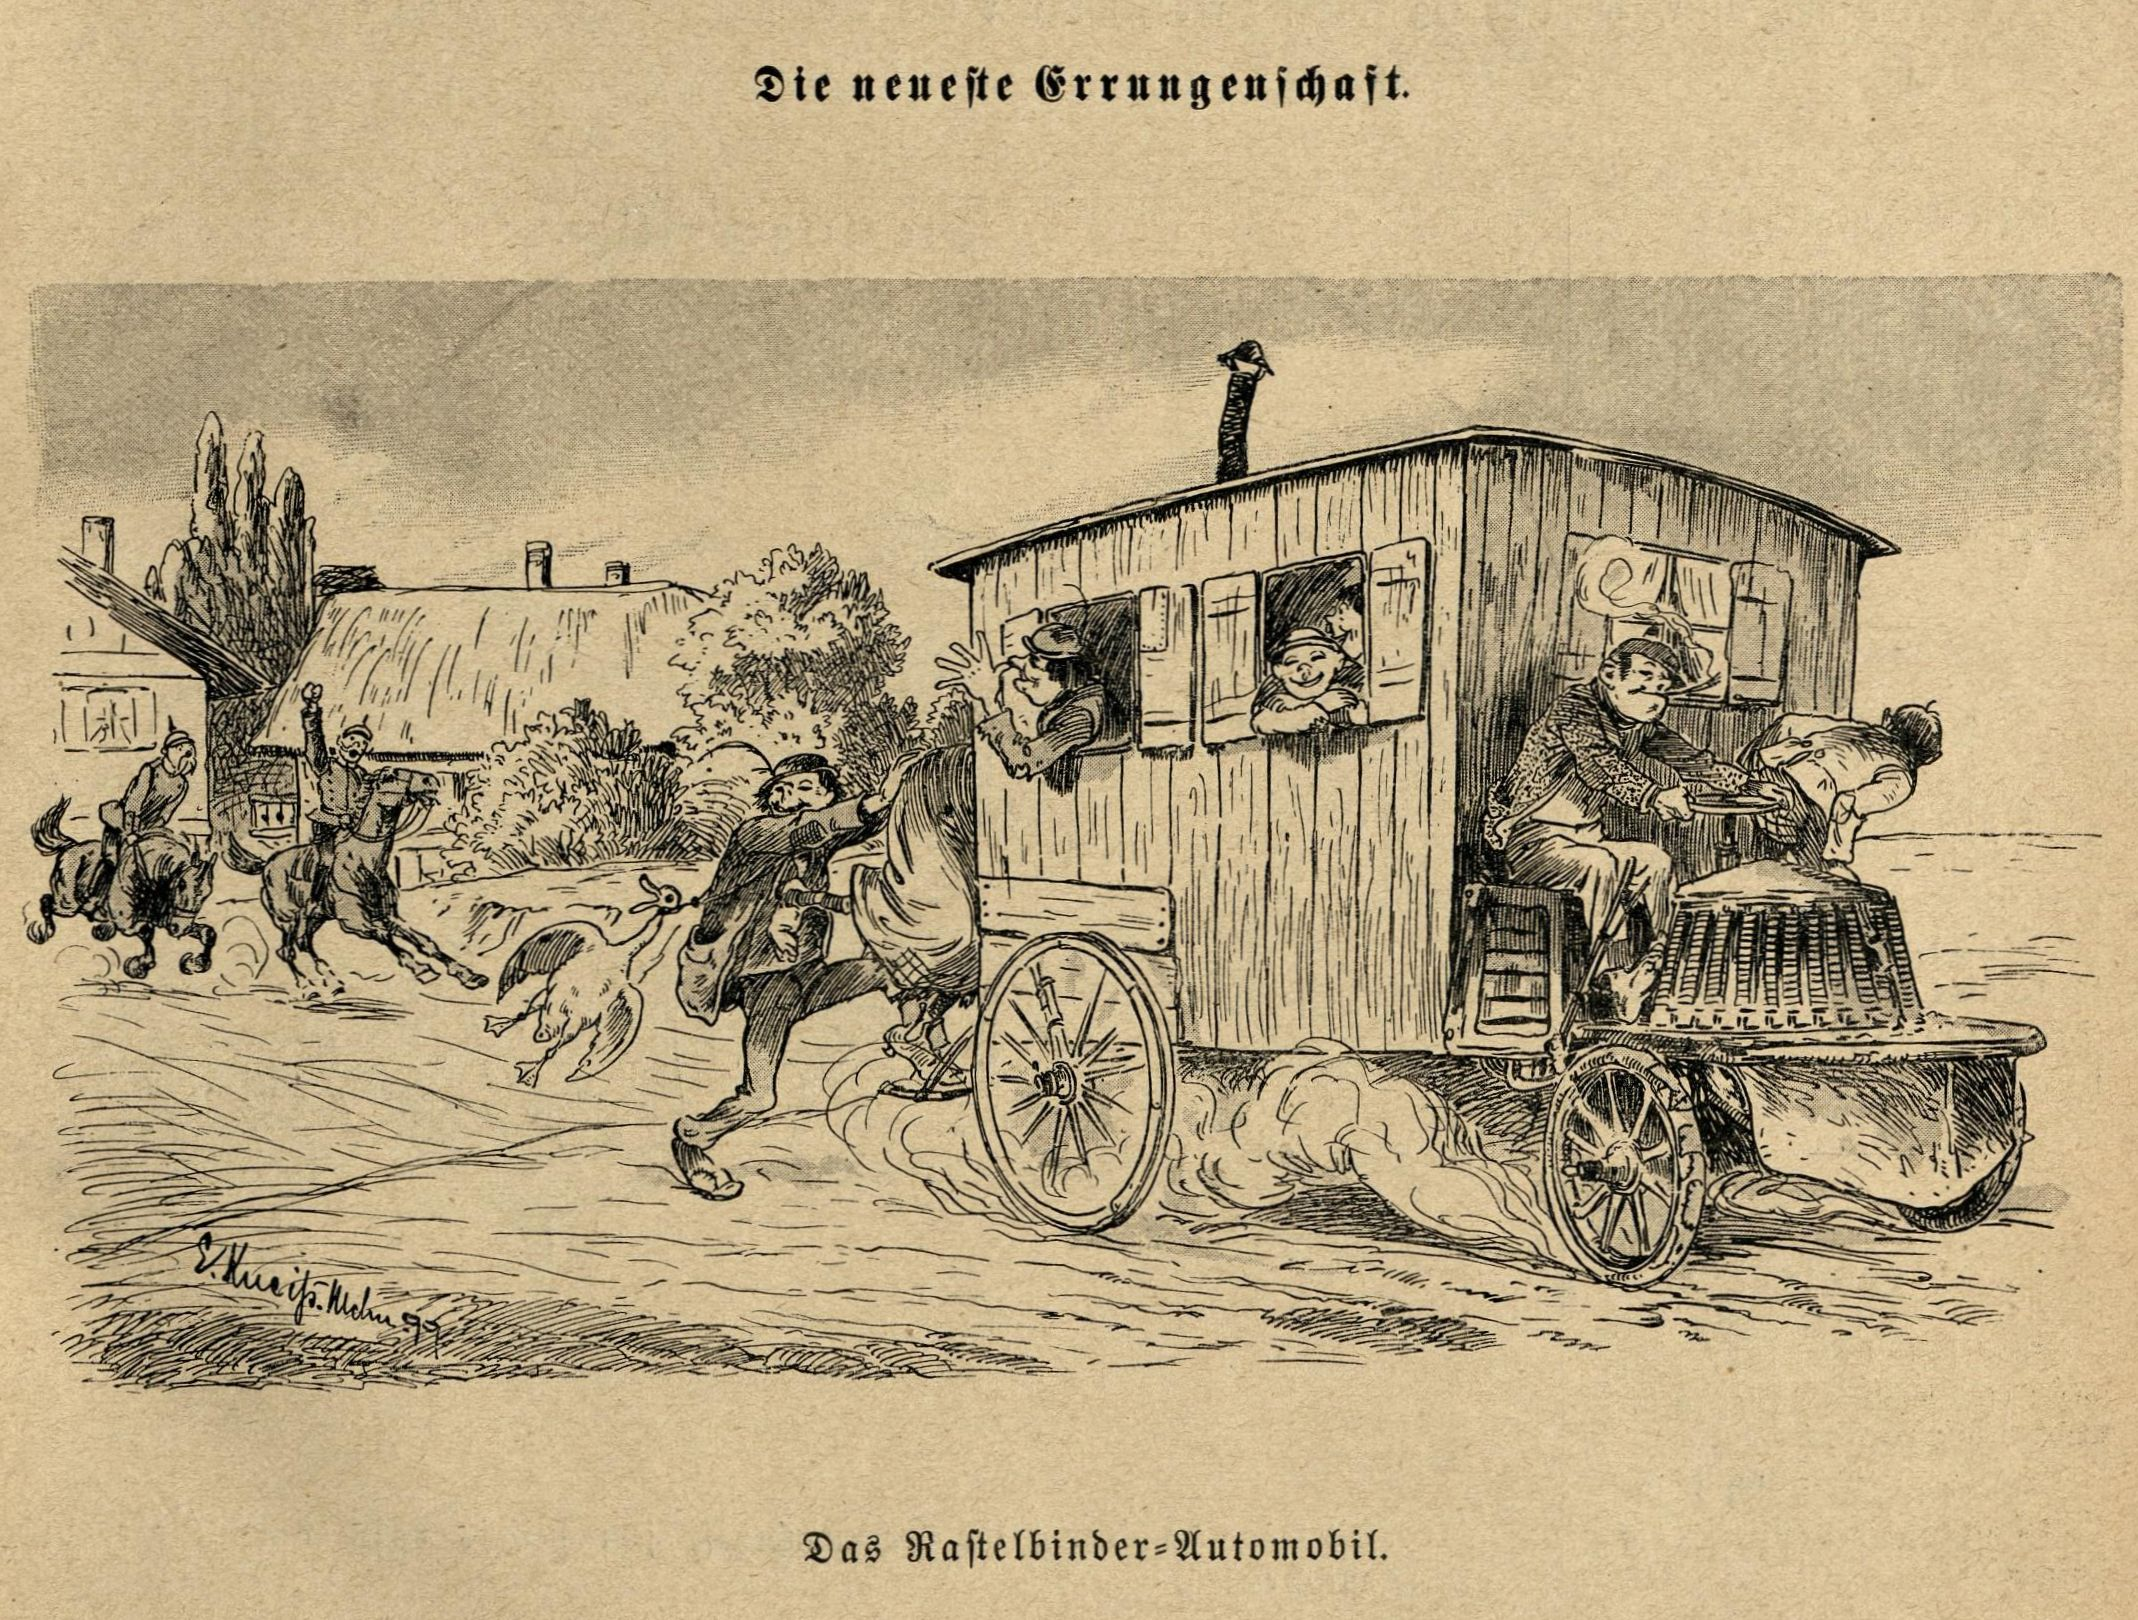 Bild: Das Rastelbinder-Automobil